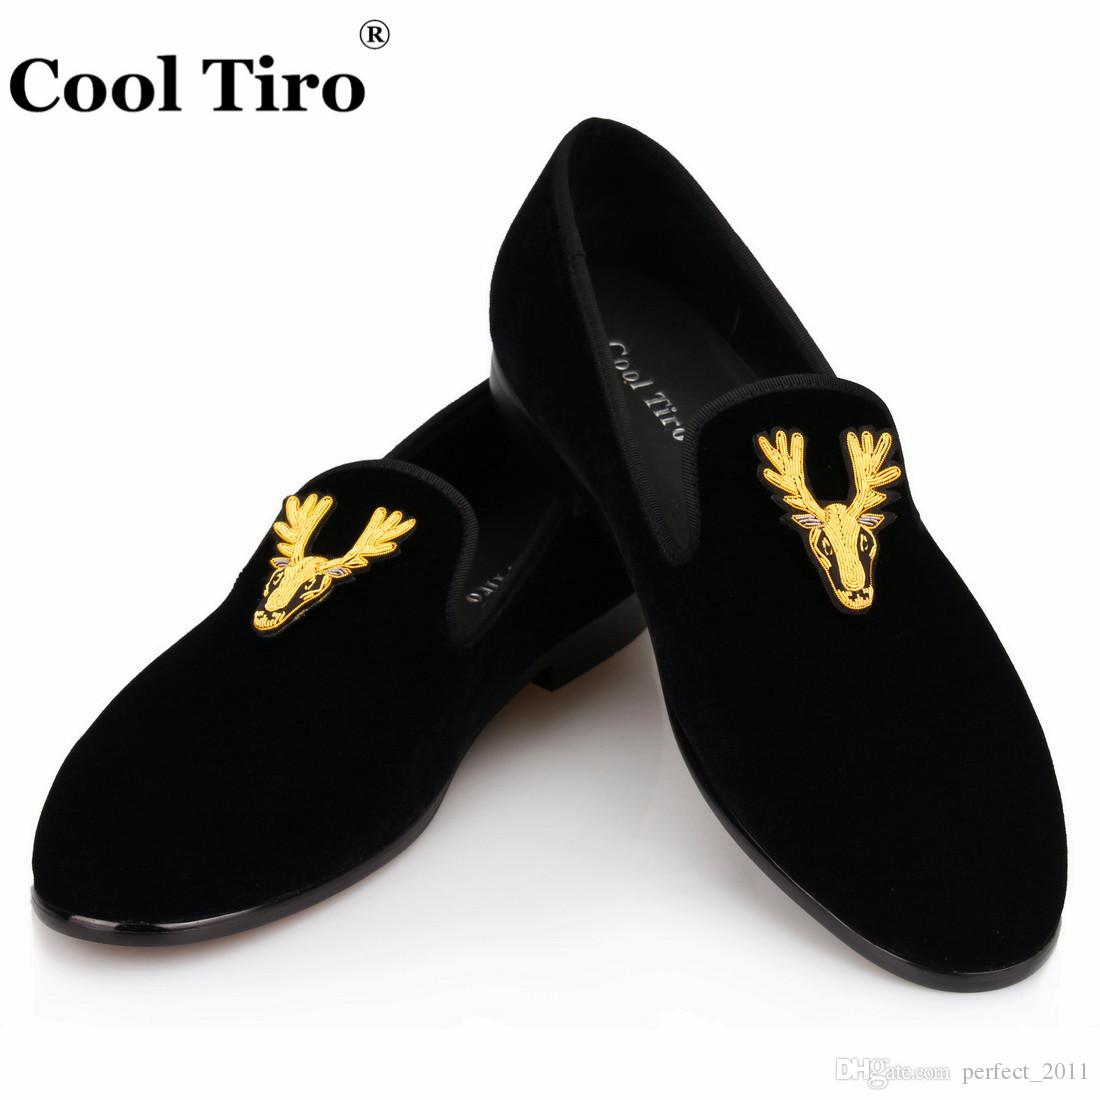 22429172a80 2017 New Men Loafers Black Velvet Slip Slippers India Handmade Embroidery  Men Velvet Shoes Moccasin Men S Flats Genuine Leather Casual Shoes Mens  Casual ...